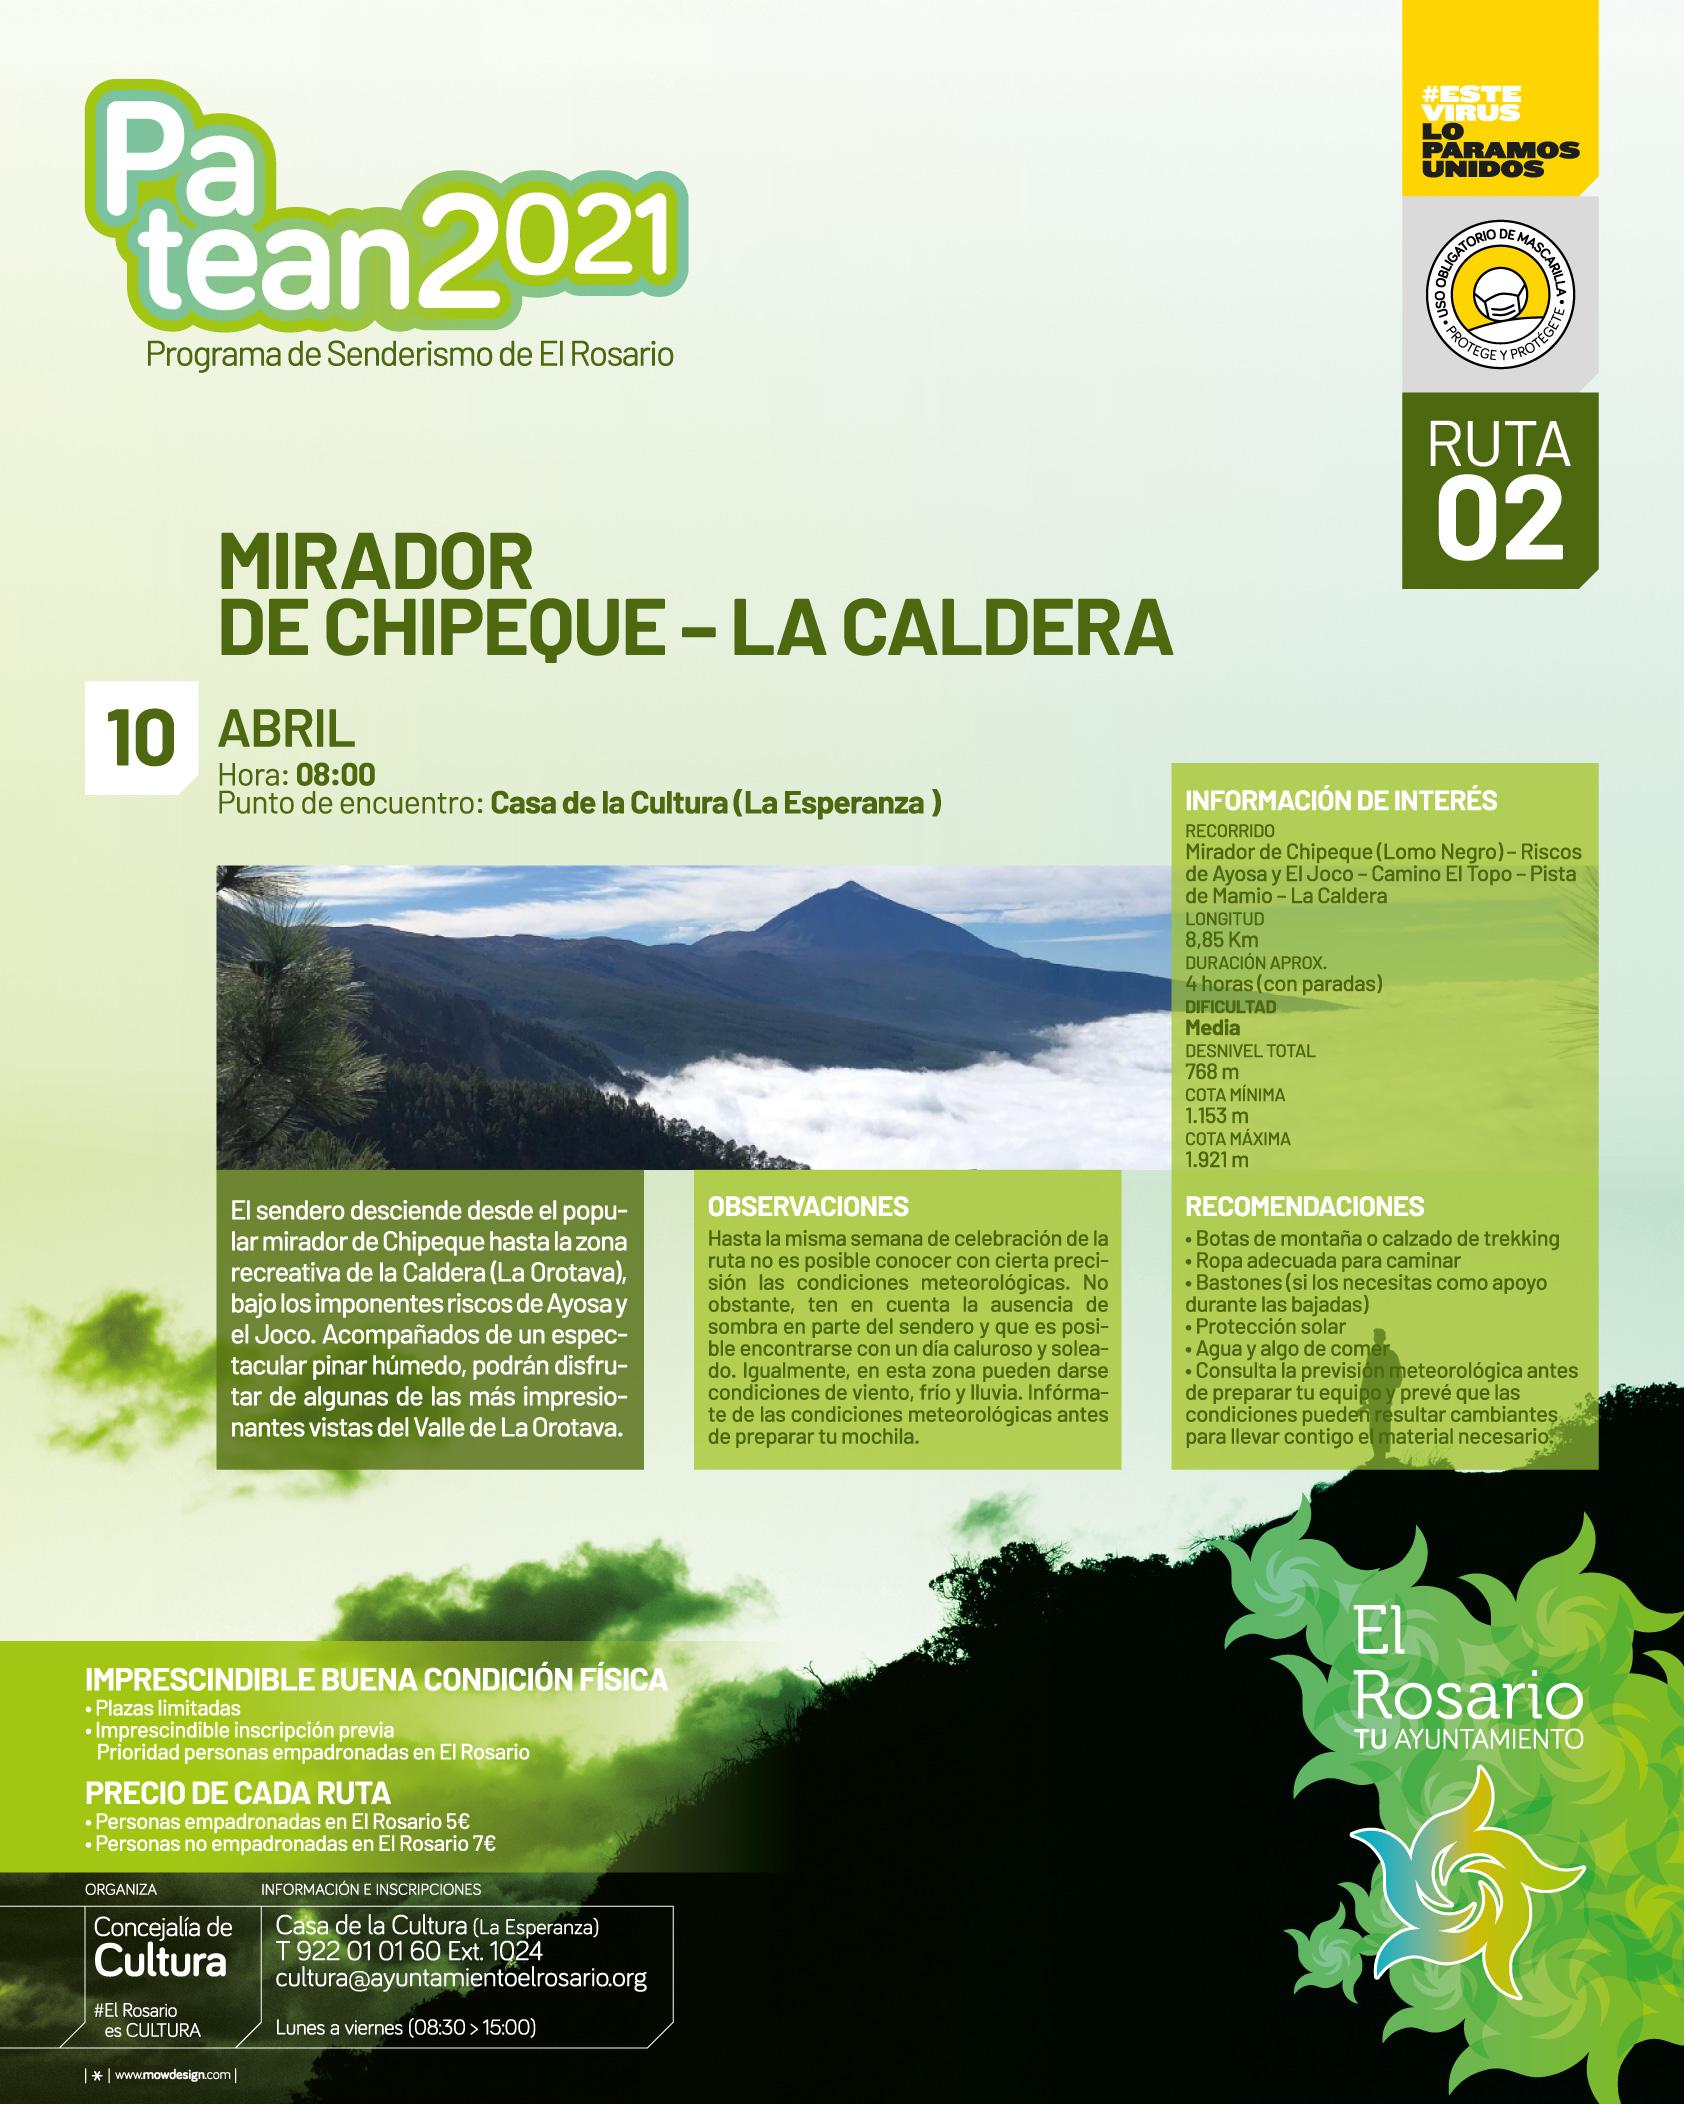 PATEAN2-RUTA_02-20210410-CARTEL_A3-20210322-01af-redes